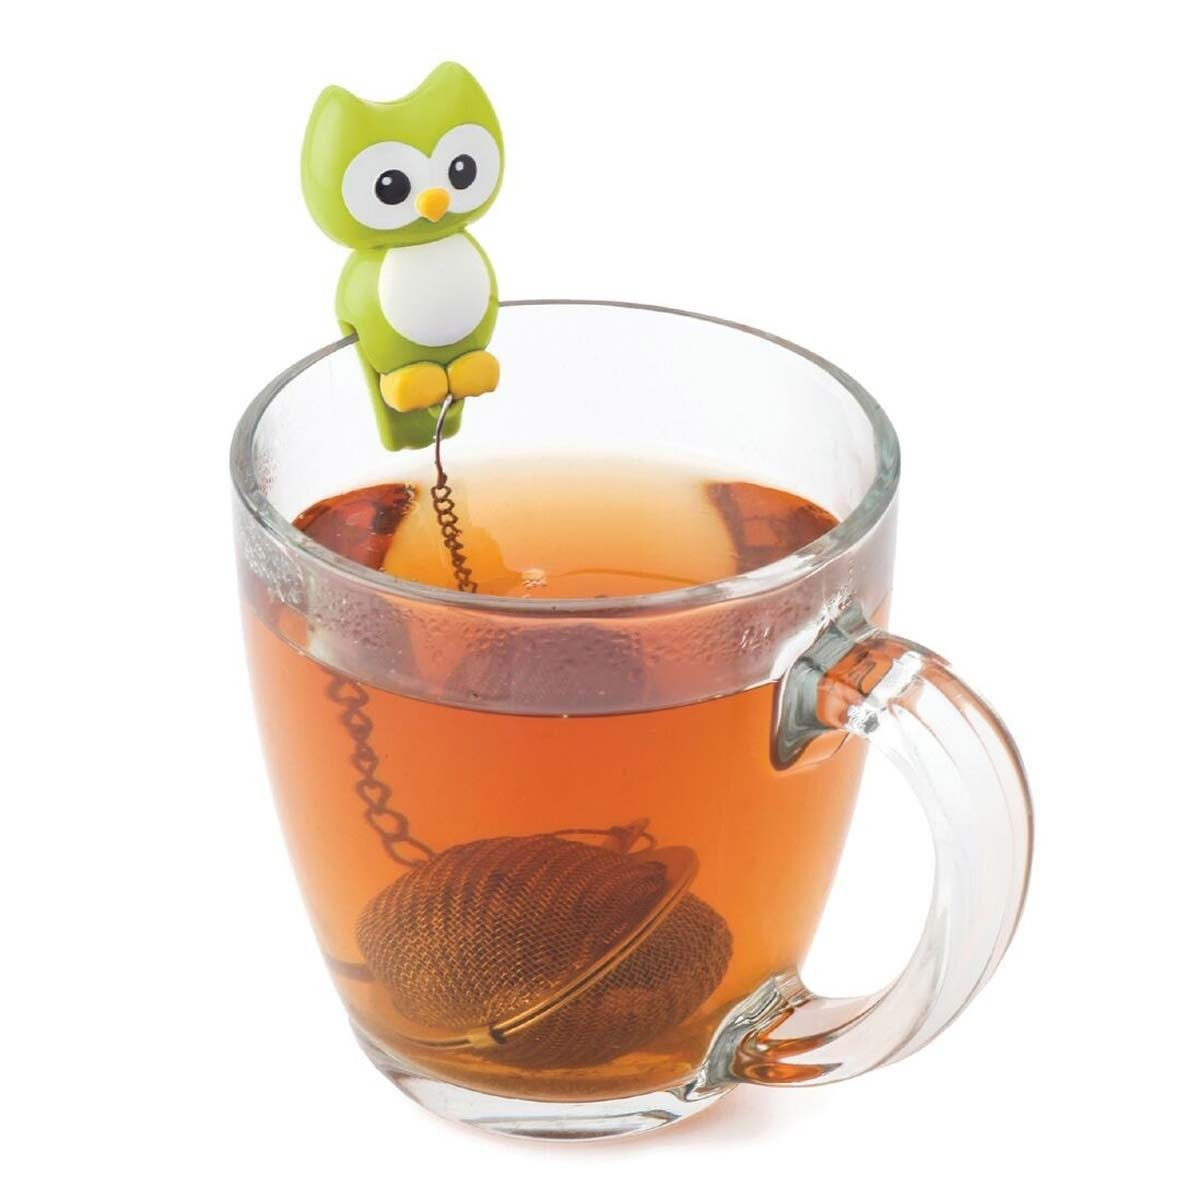 Pin by Rachel Watson on Tea Time Set Tea infuser, Tea cups